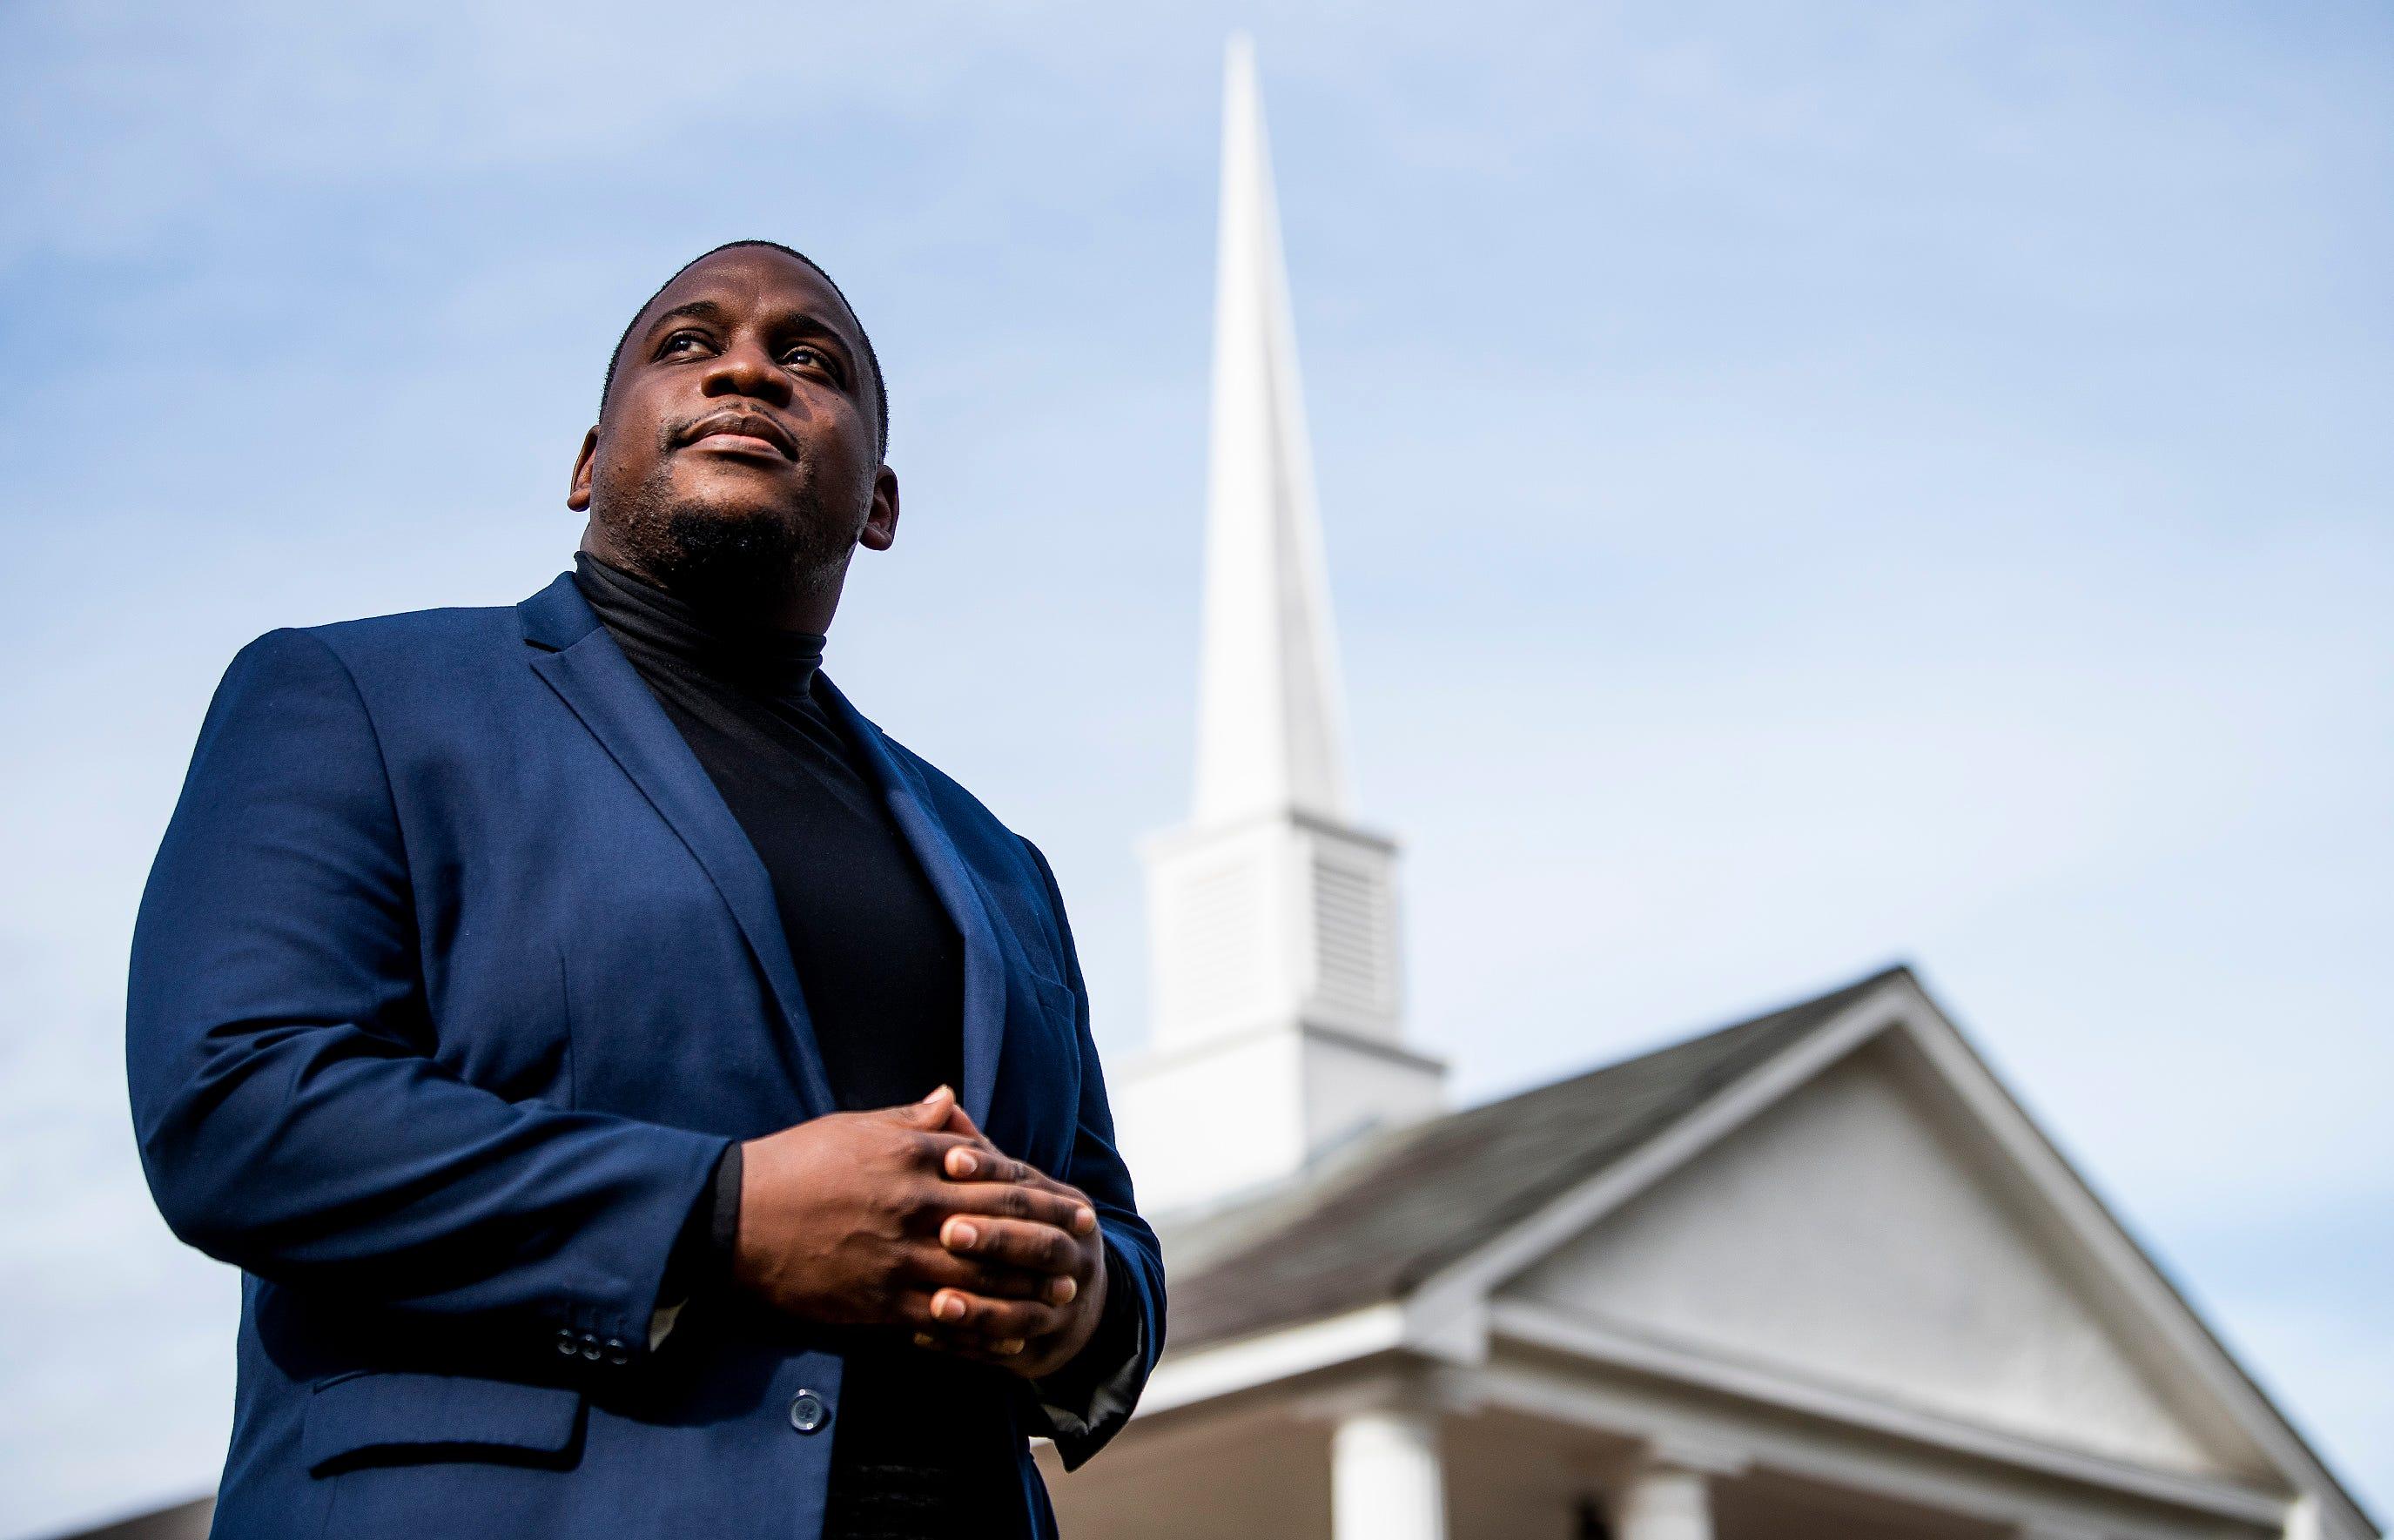 Pastor Richard Williams